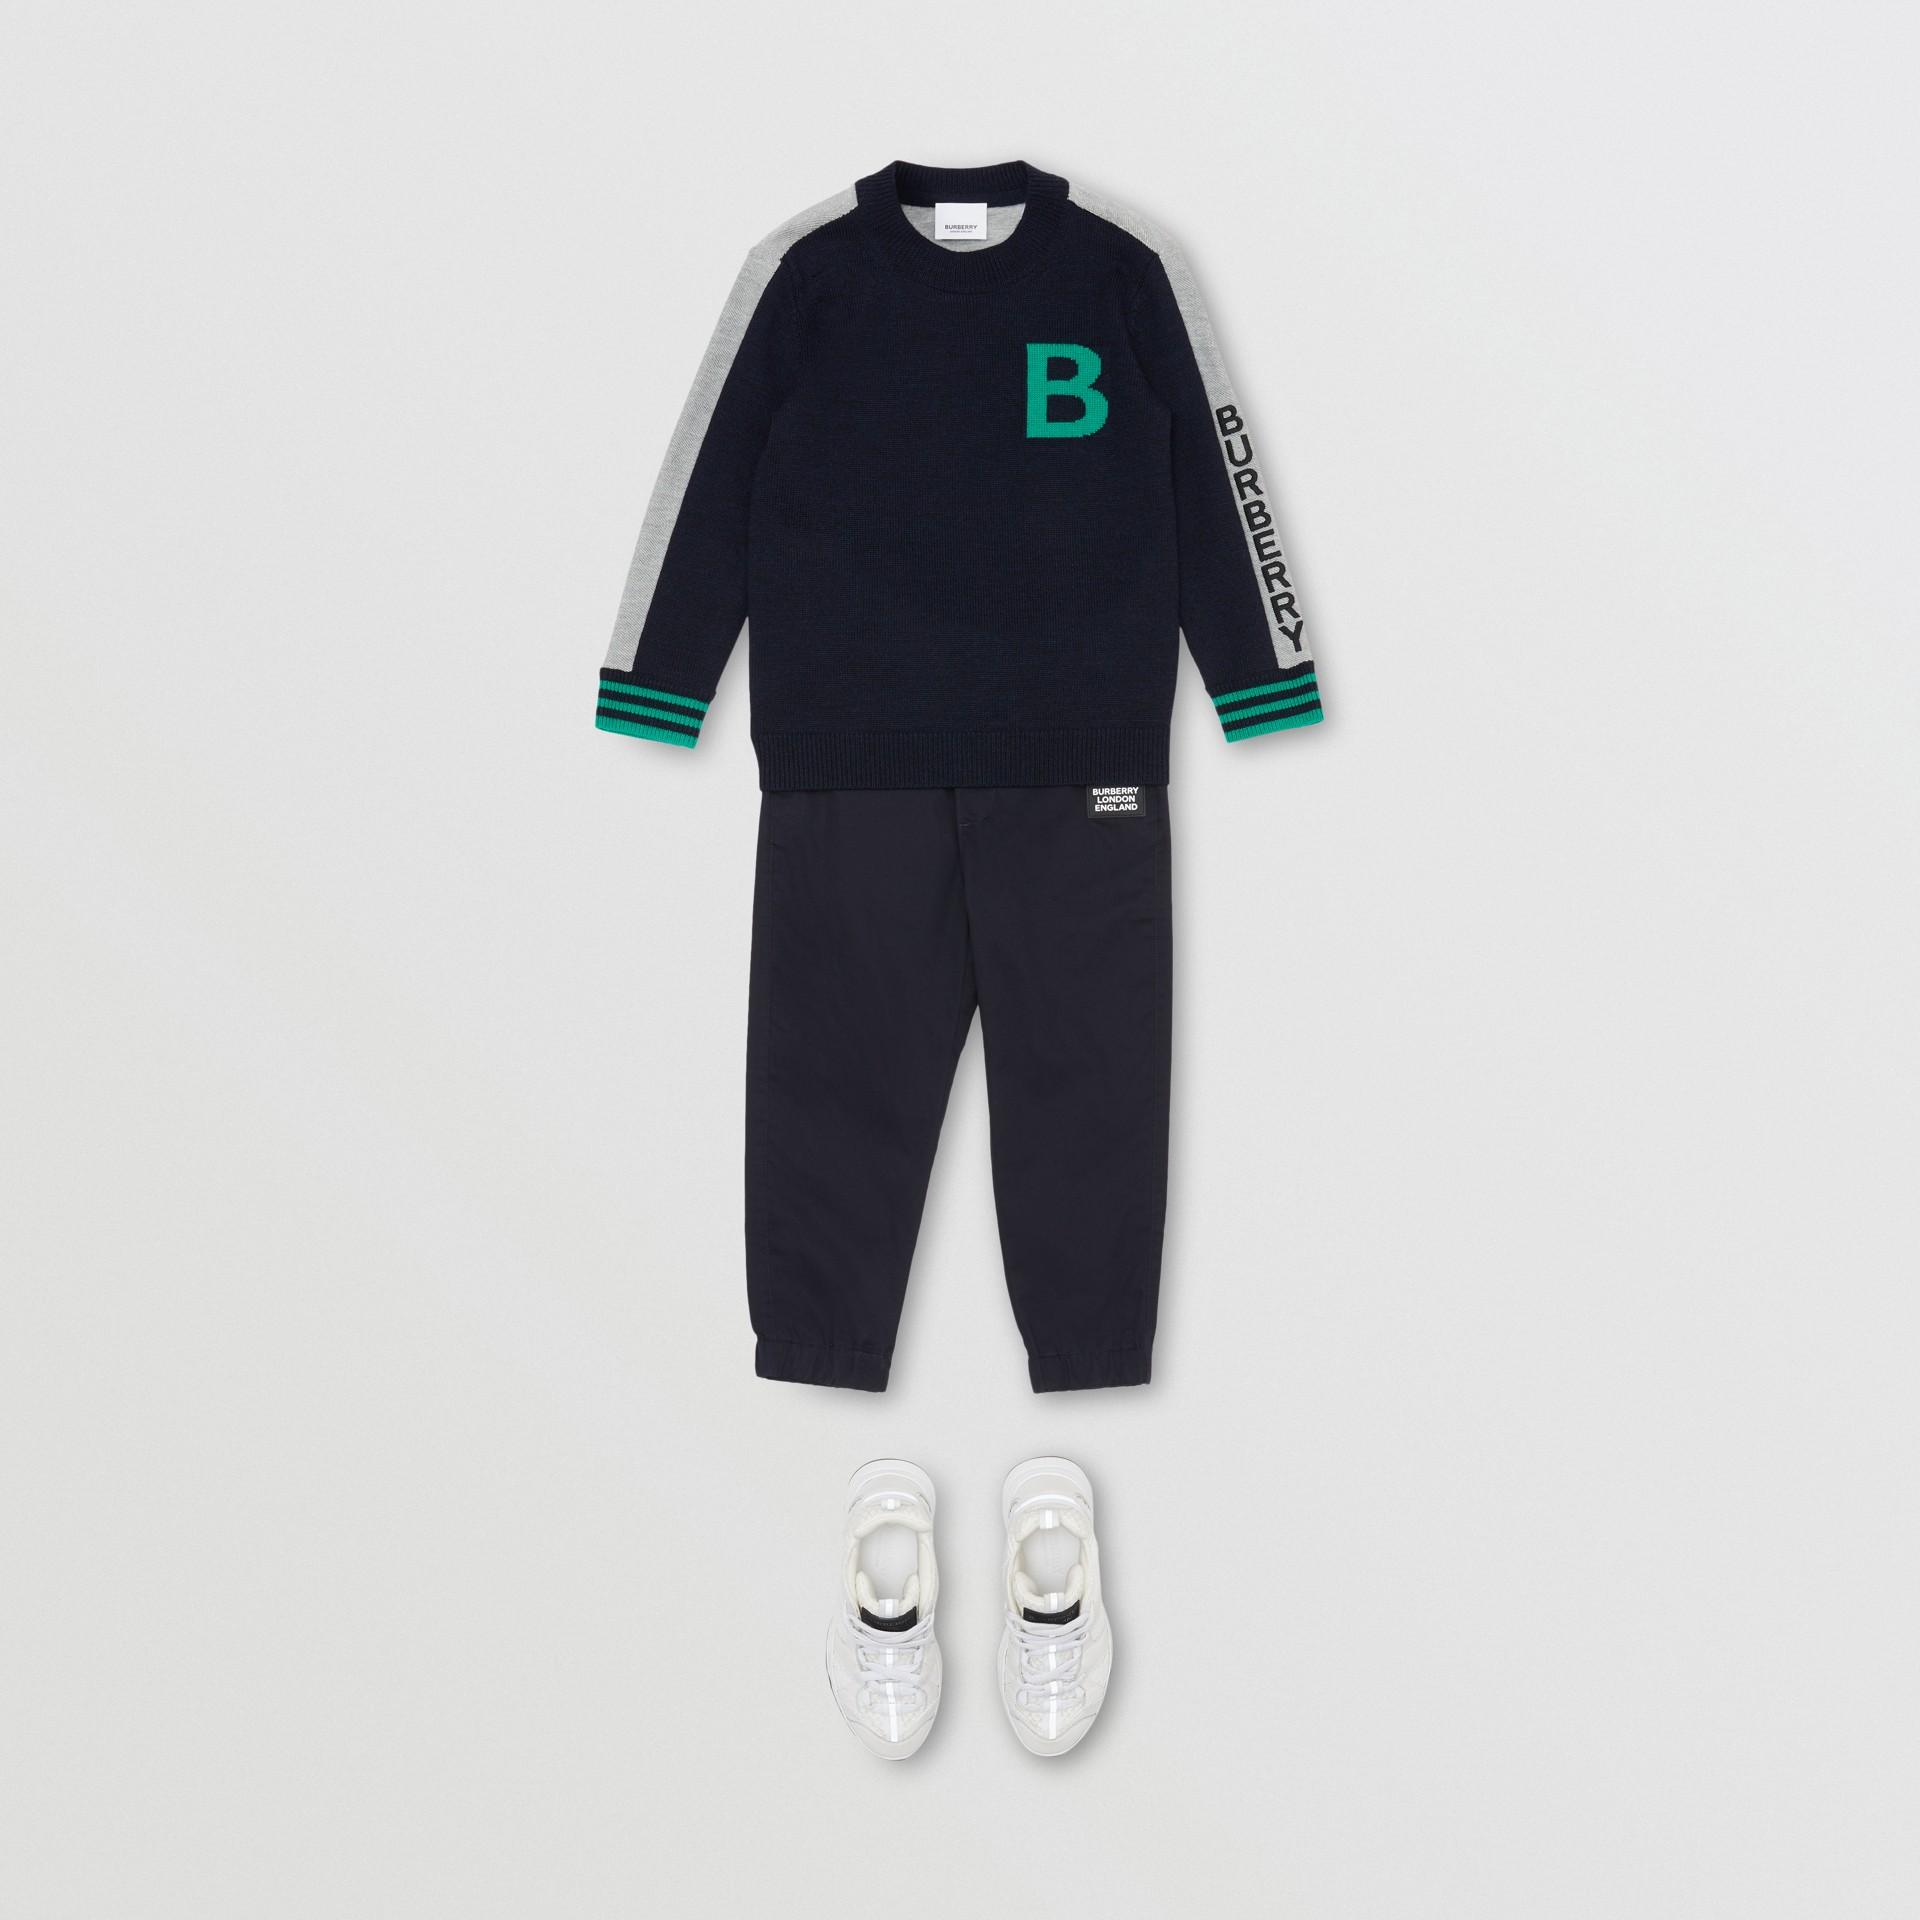 B Motif Merino Wool Jacquard Sweater in Navy | Burberry - gallery image 3